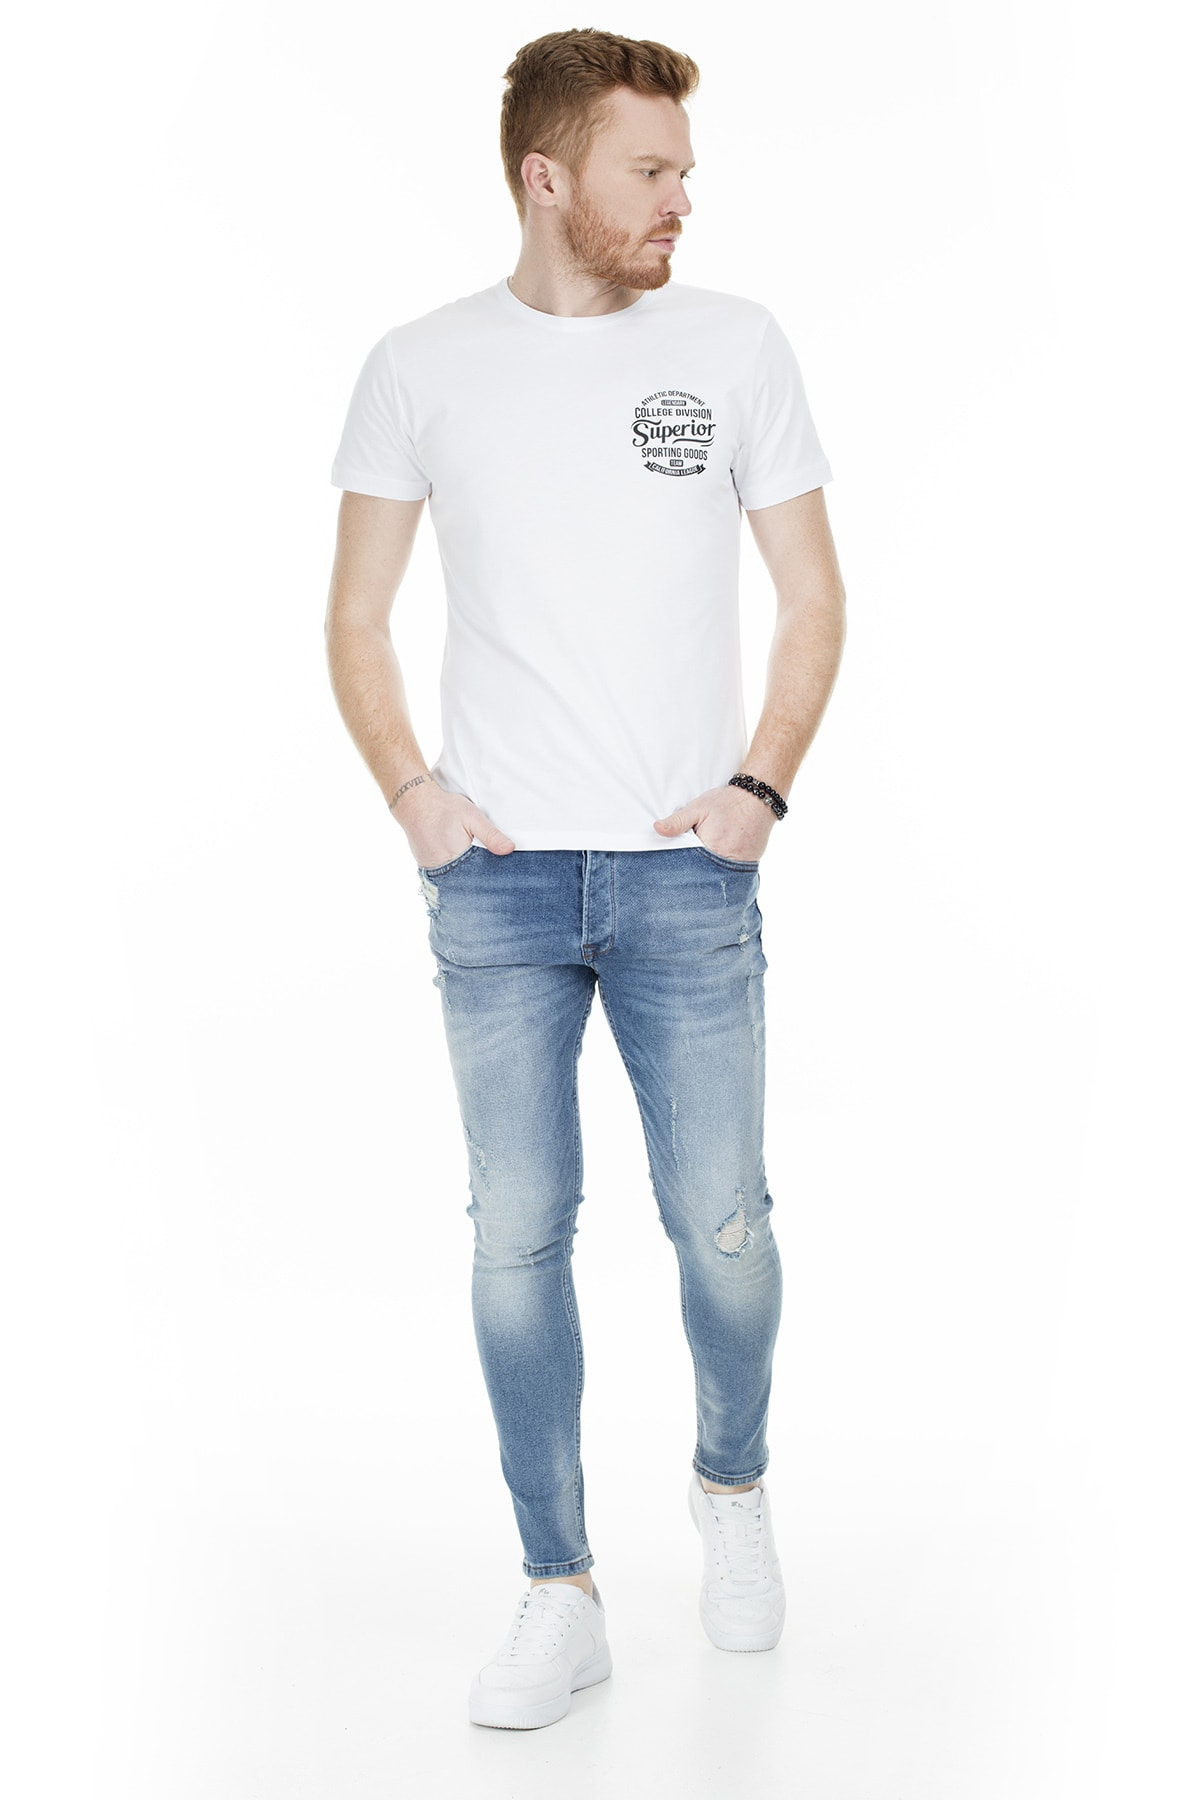 Buratti Erkek AÇIK MAVİ Normal Bel Dar Paça Skinny Jeans Pamuklu Kot Pantolon 7302N9401GHOST